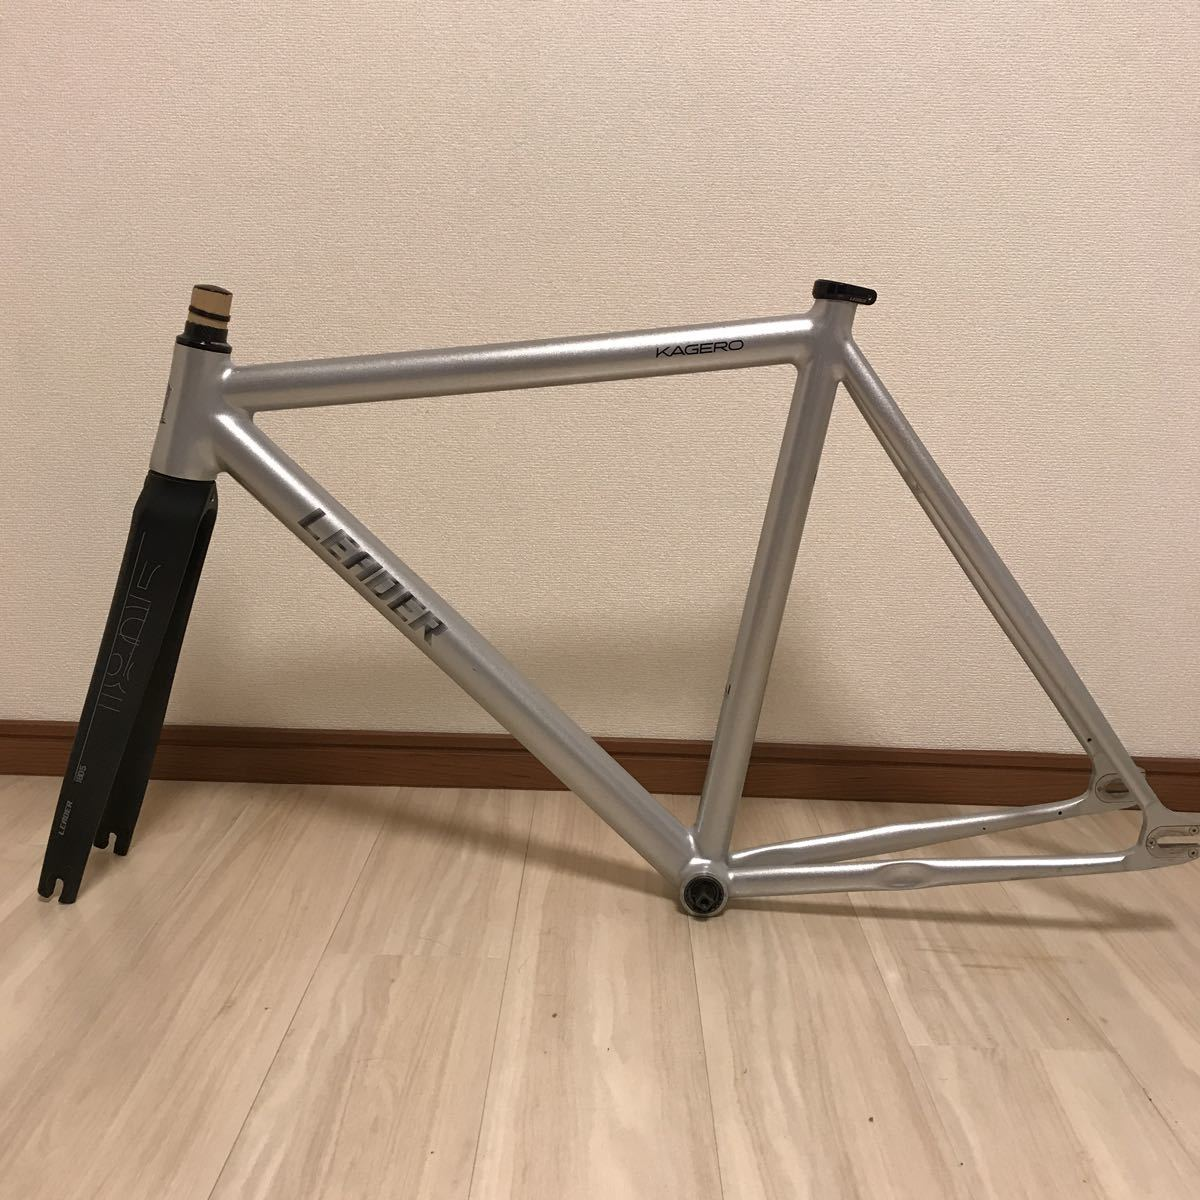 leader bikes kagero リーダーバイク カゲロウ サイズM 極上美品!! ピスト フレーム カーボンフォーク_画像2